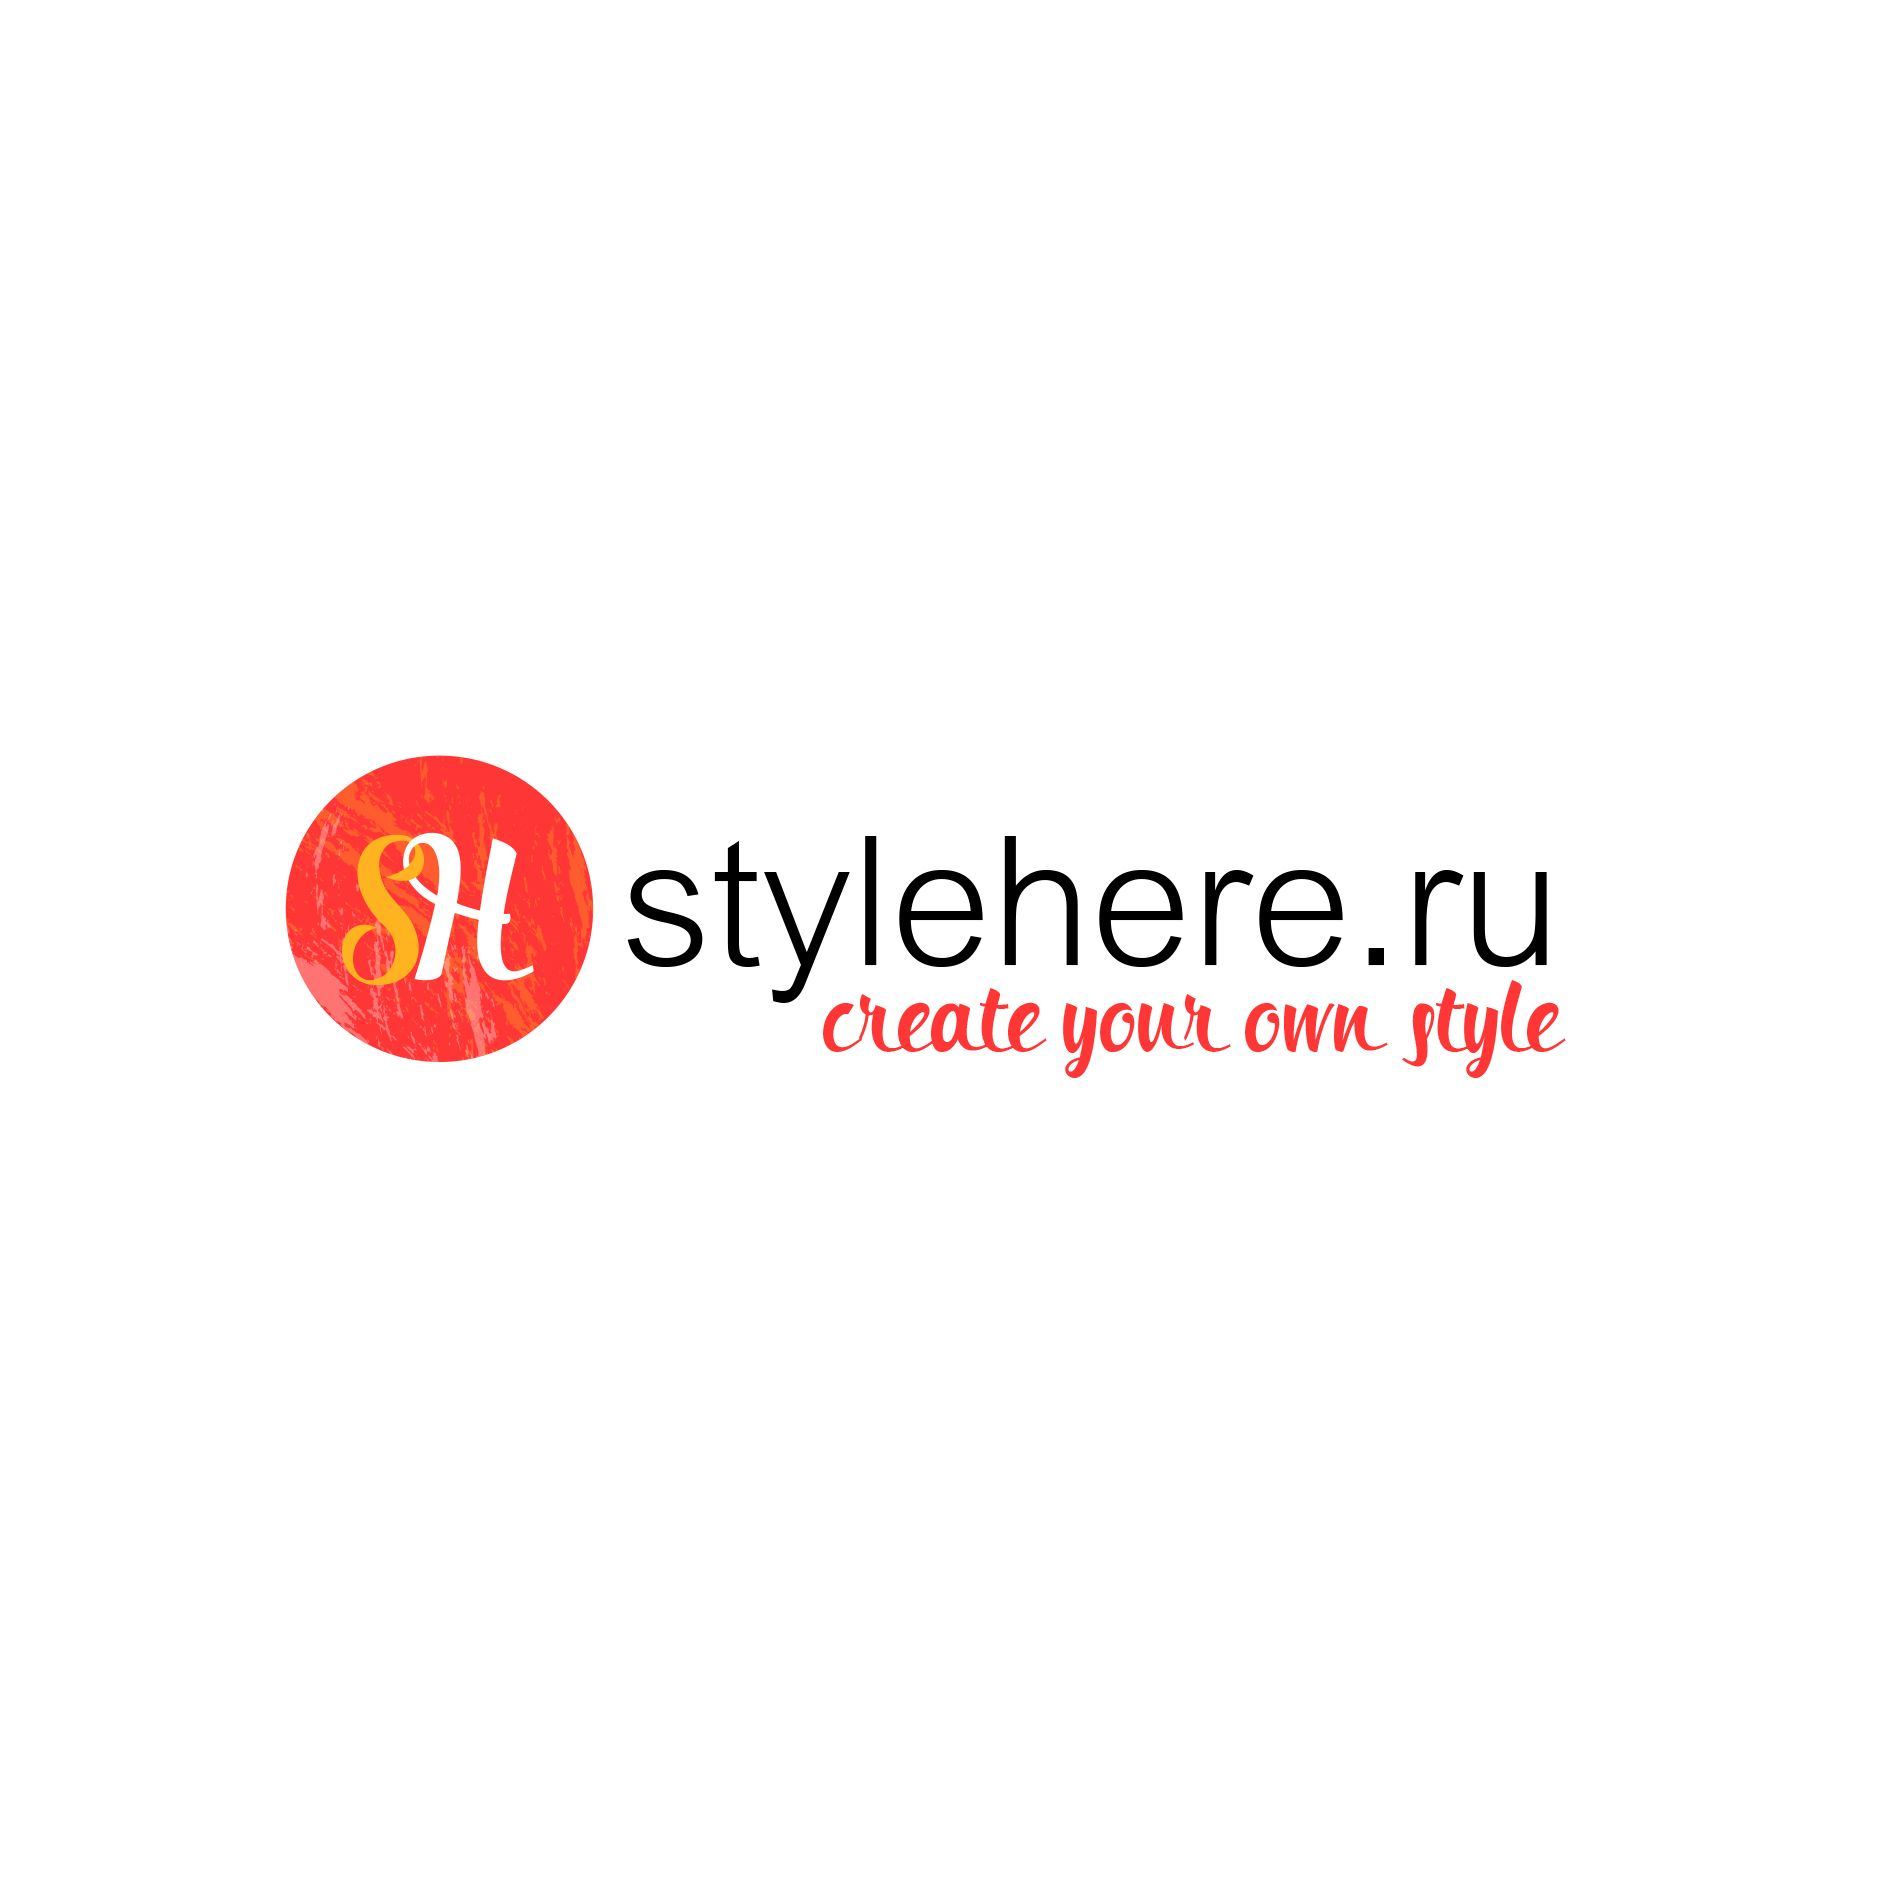 Логотип для интернет-магазина stylehere.ru - дизайнер Vladlena_A